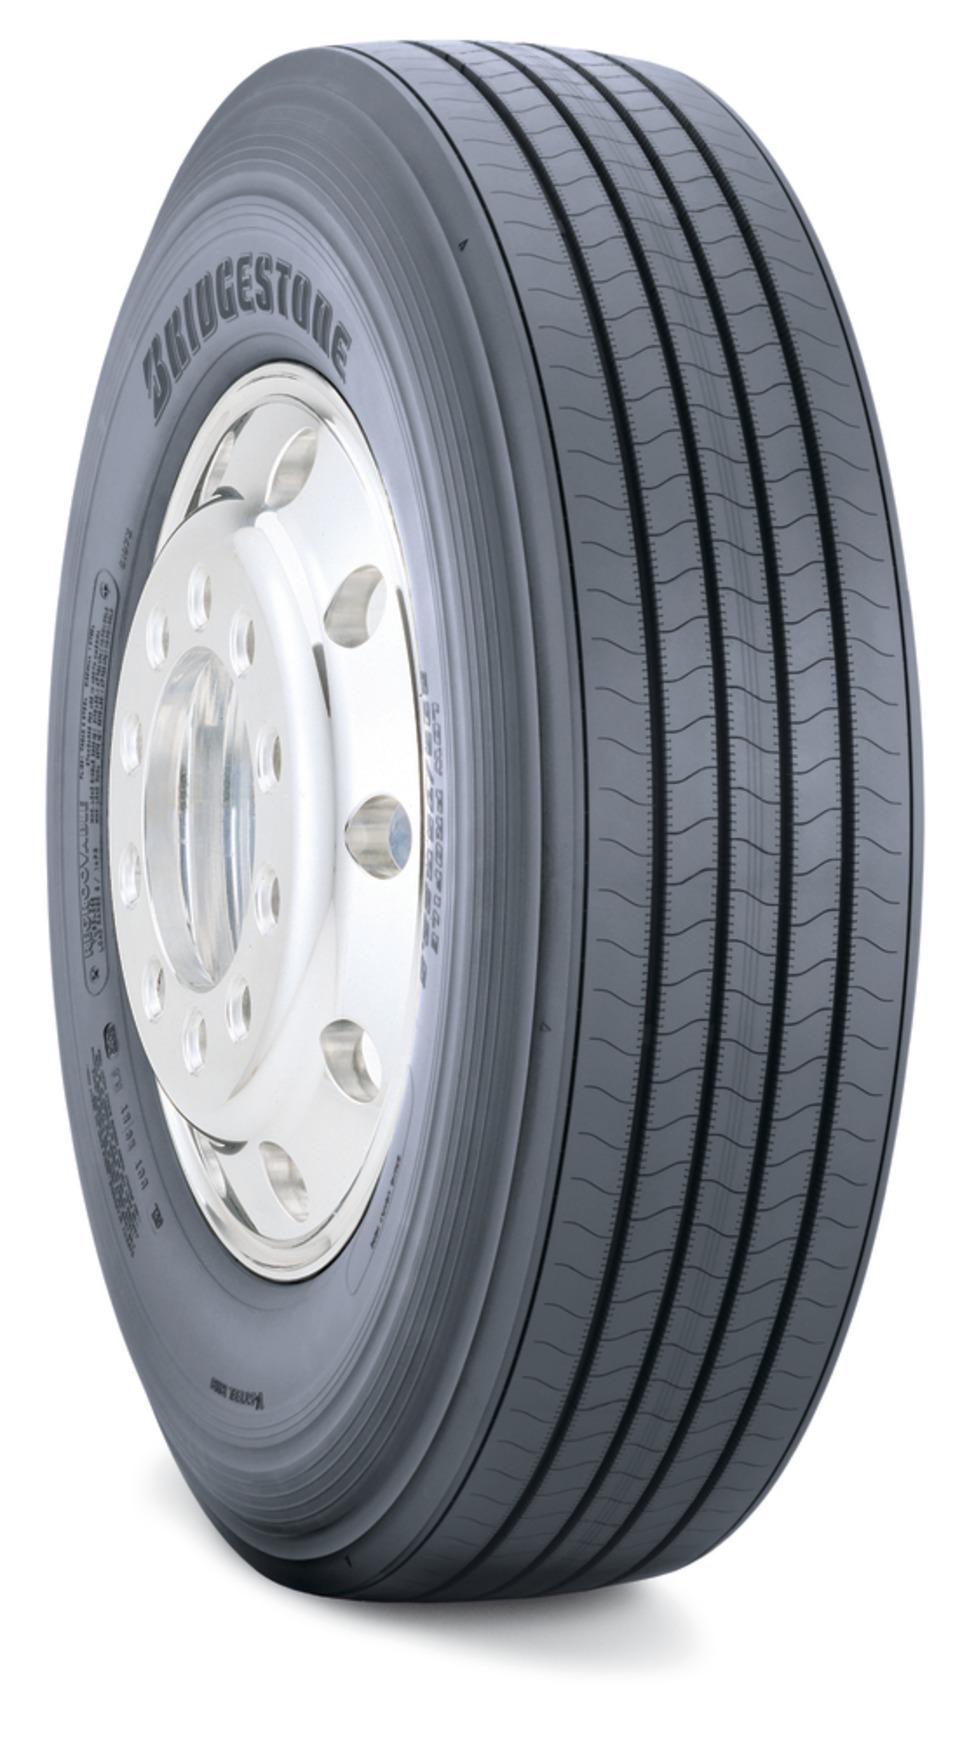 Bridgestone Introduces New Heavy-Duty Pickup Truck Tire  Bridgestone Firestone Truck Tires